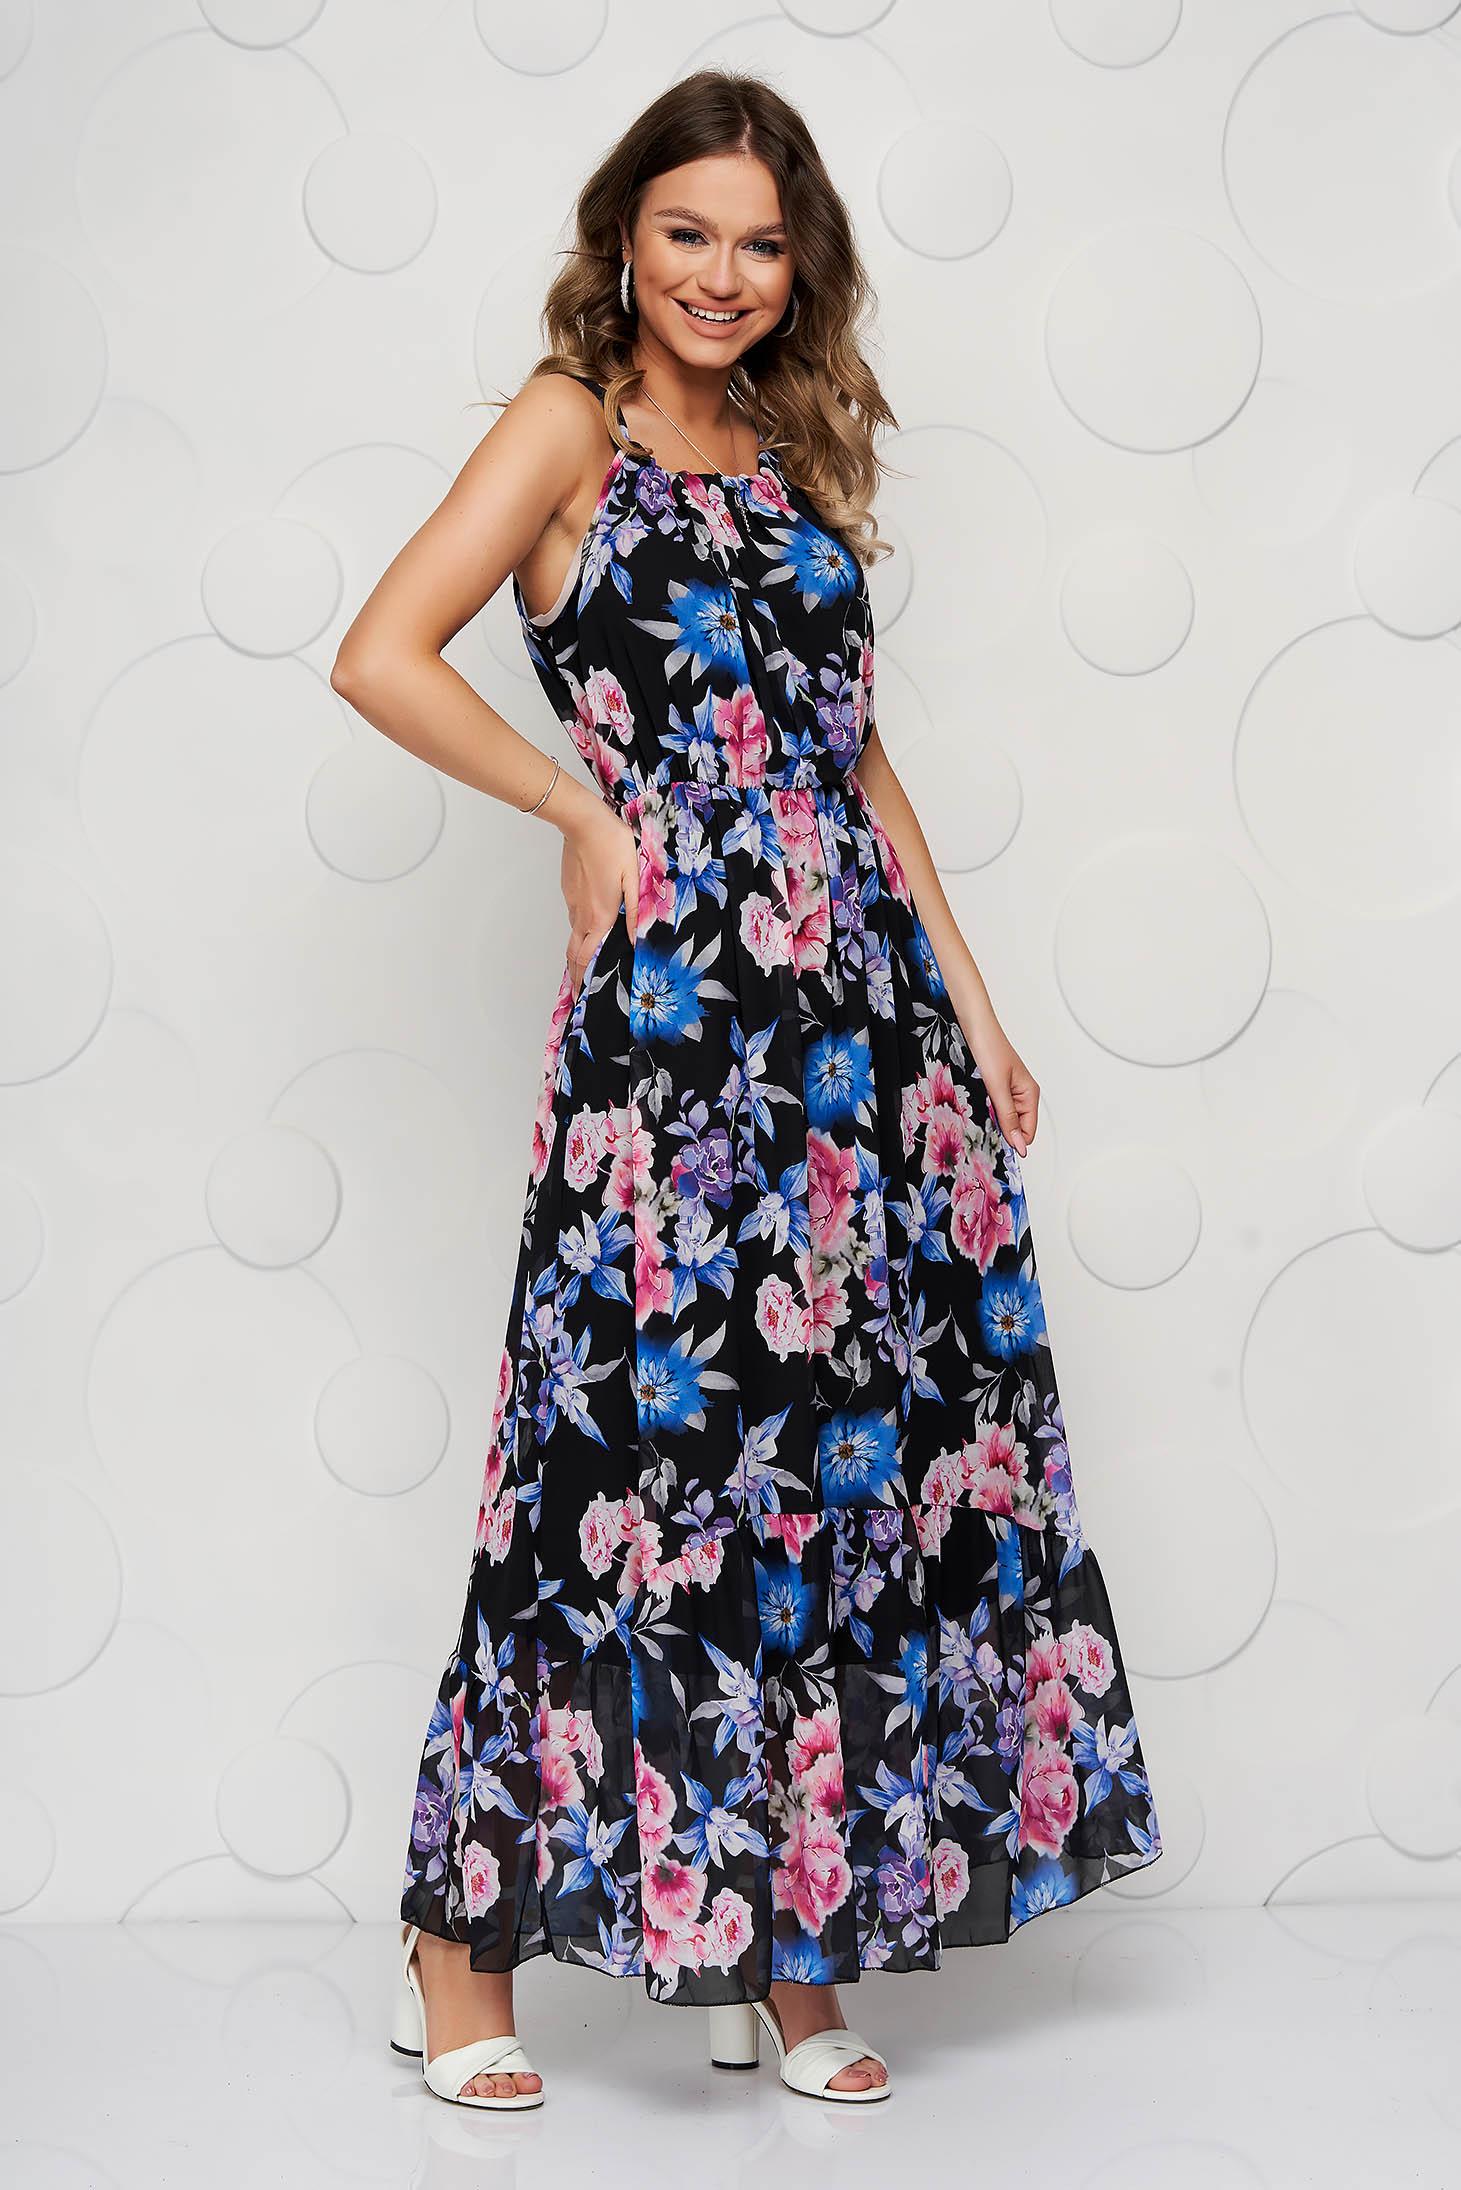 StarShinerS black dress long daily sleeveless thin fabric cloche with elastic waist